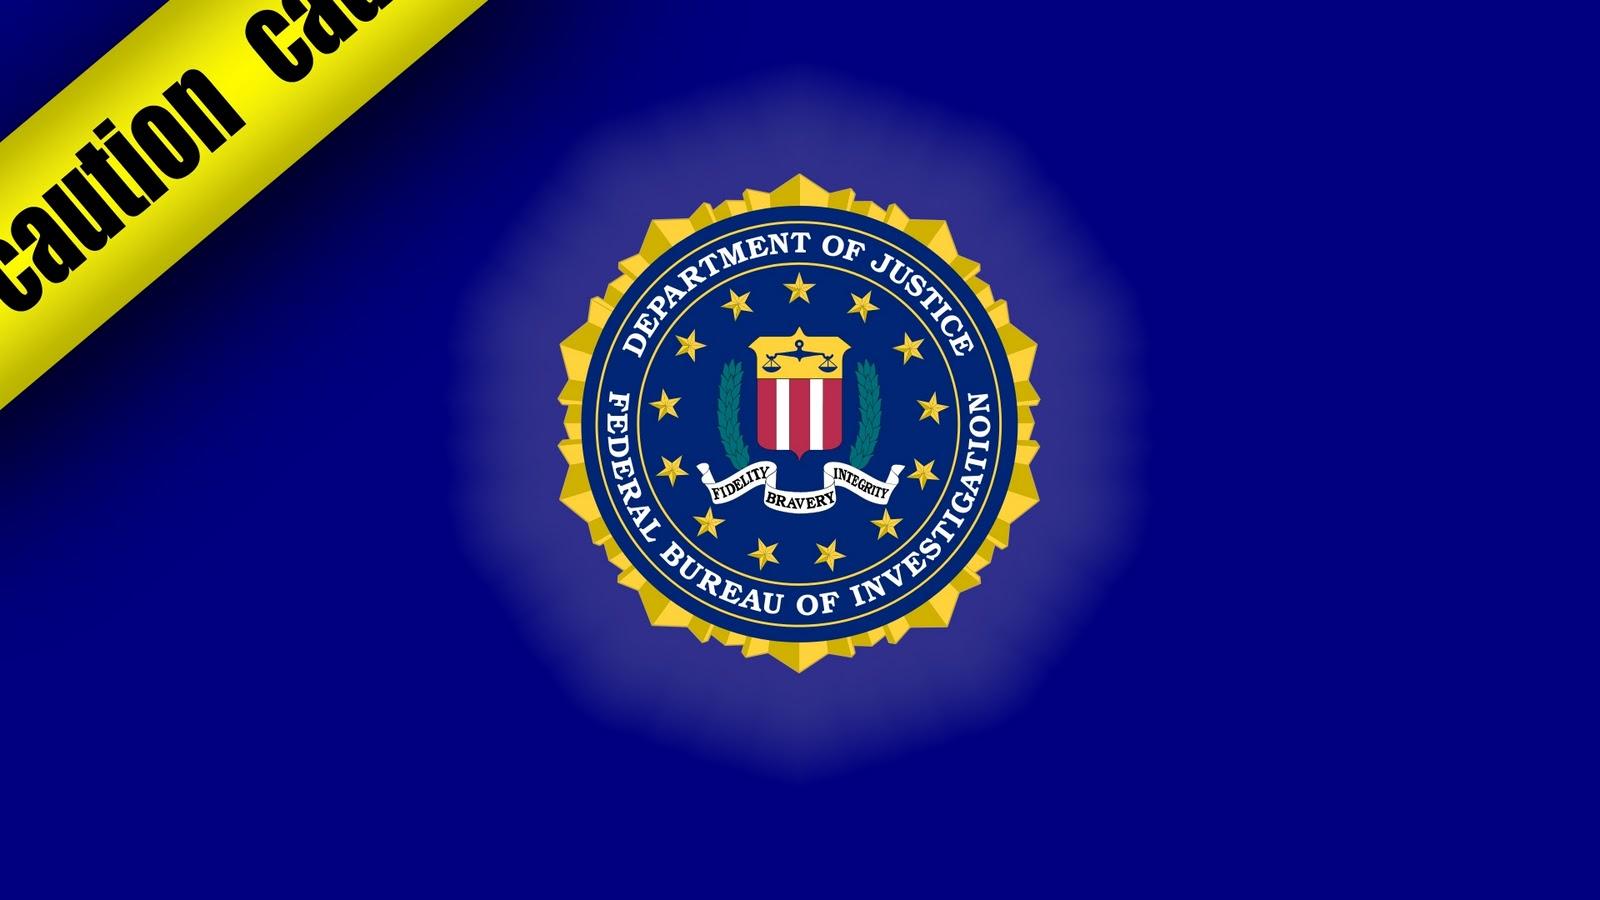 http://1.bp.blogspot.com/-JFTe_nO_q70/TrqqcL9B-OI/AAAAAAAABHs/hKAkRlowT10/s1600/FBI_Logo_Wallpapers.jpg